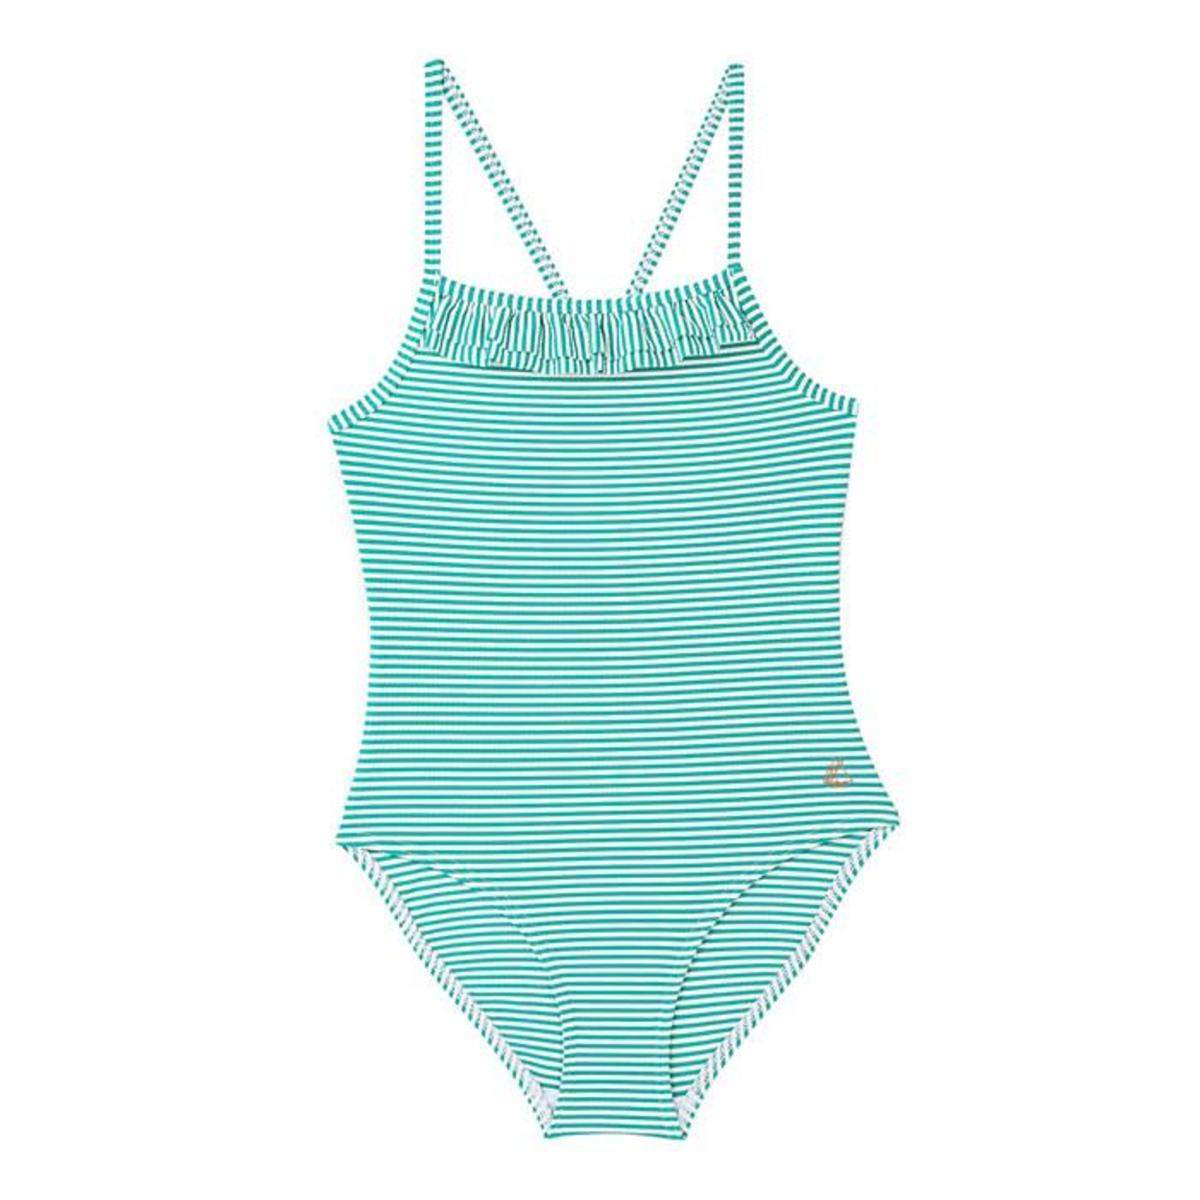 c171c5cdd1 KIDS Petit Bateau Fini One Piece Swimsuit - Green/White Stripes ...